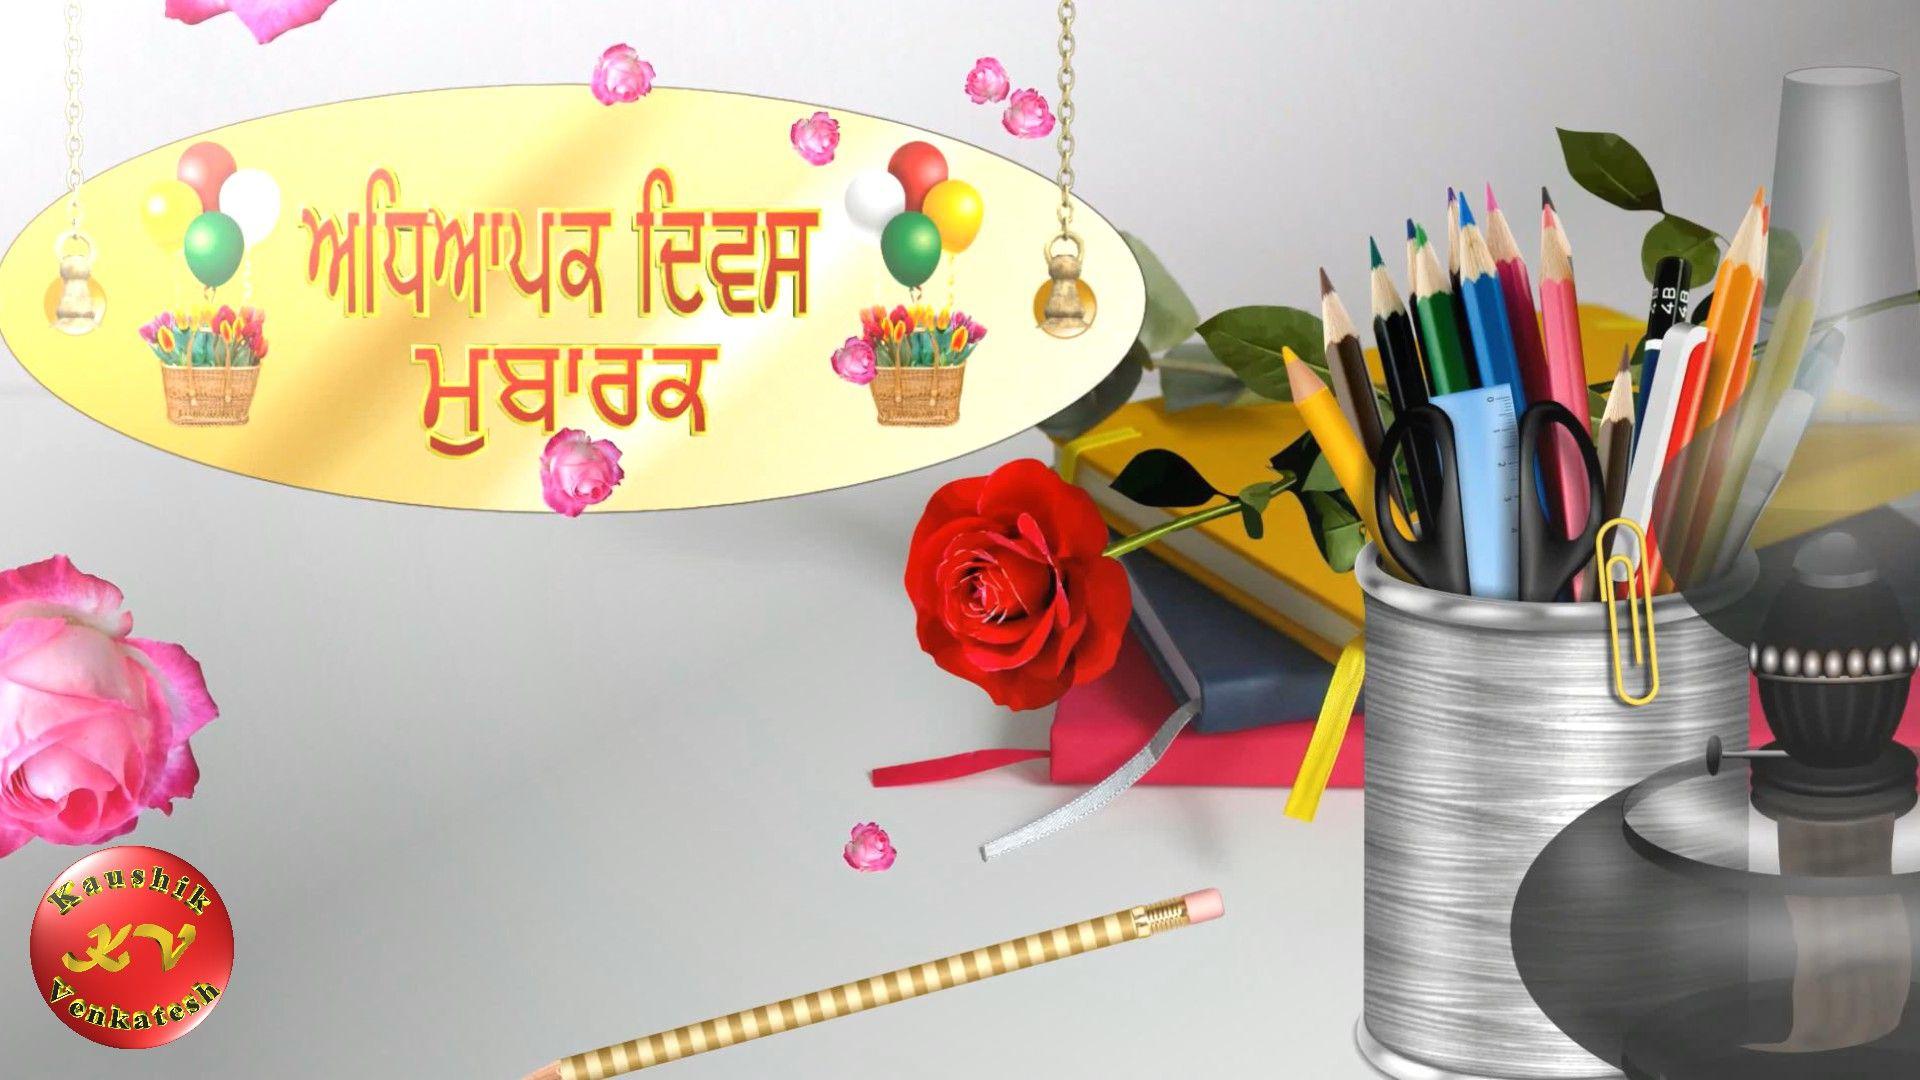 Happy Teachers Day Wishes Punjabi Status Video In 2020 Happy Teachers Day Wishes Happy Teachers Day Teachers Day Wishes